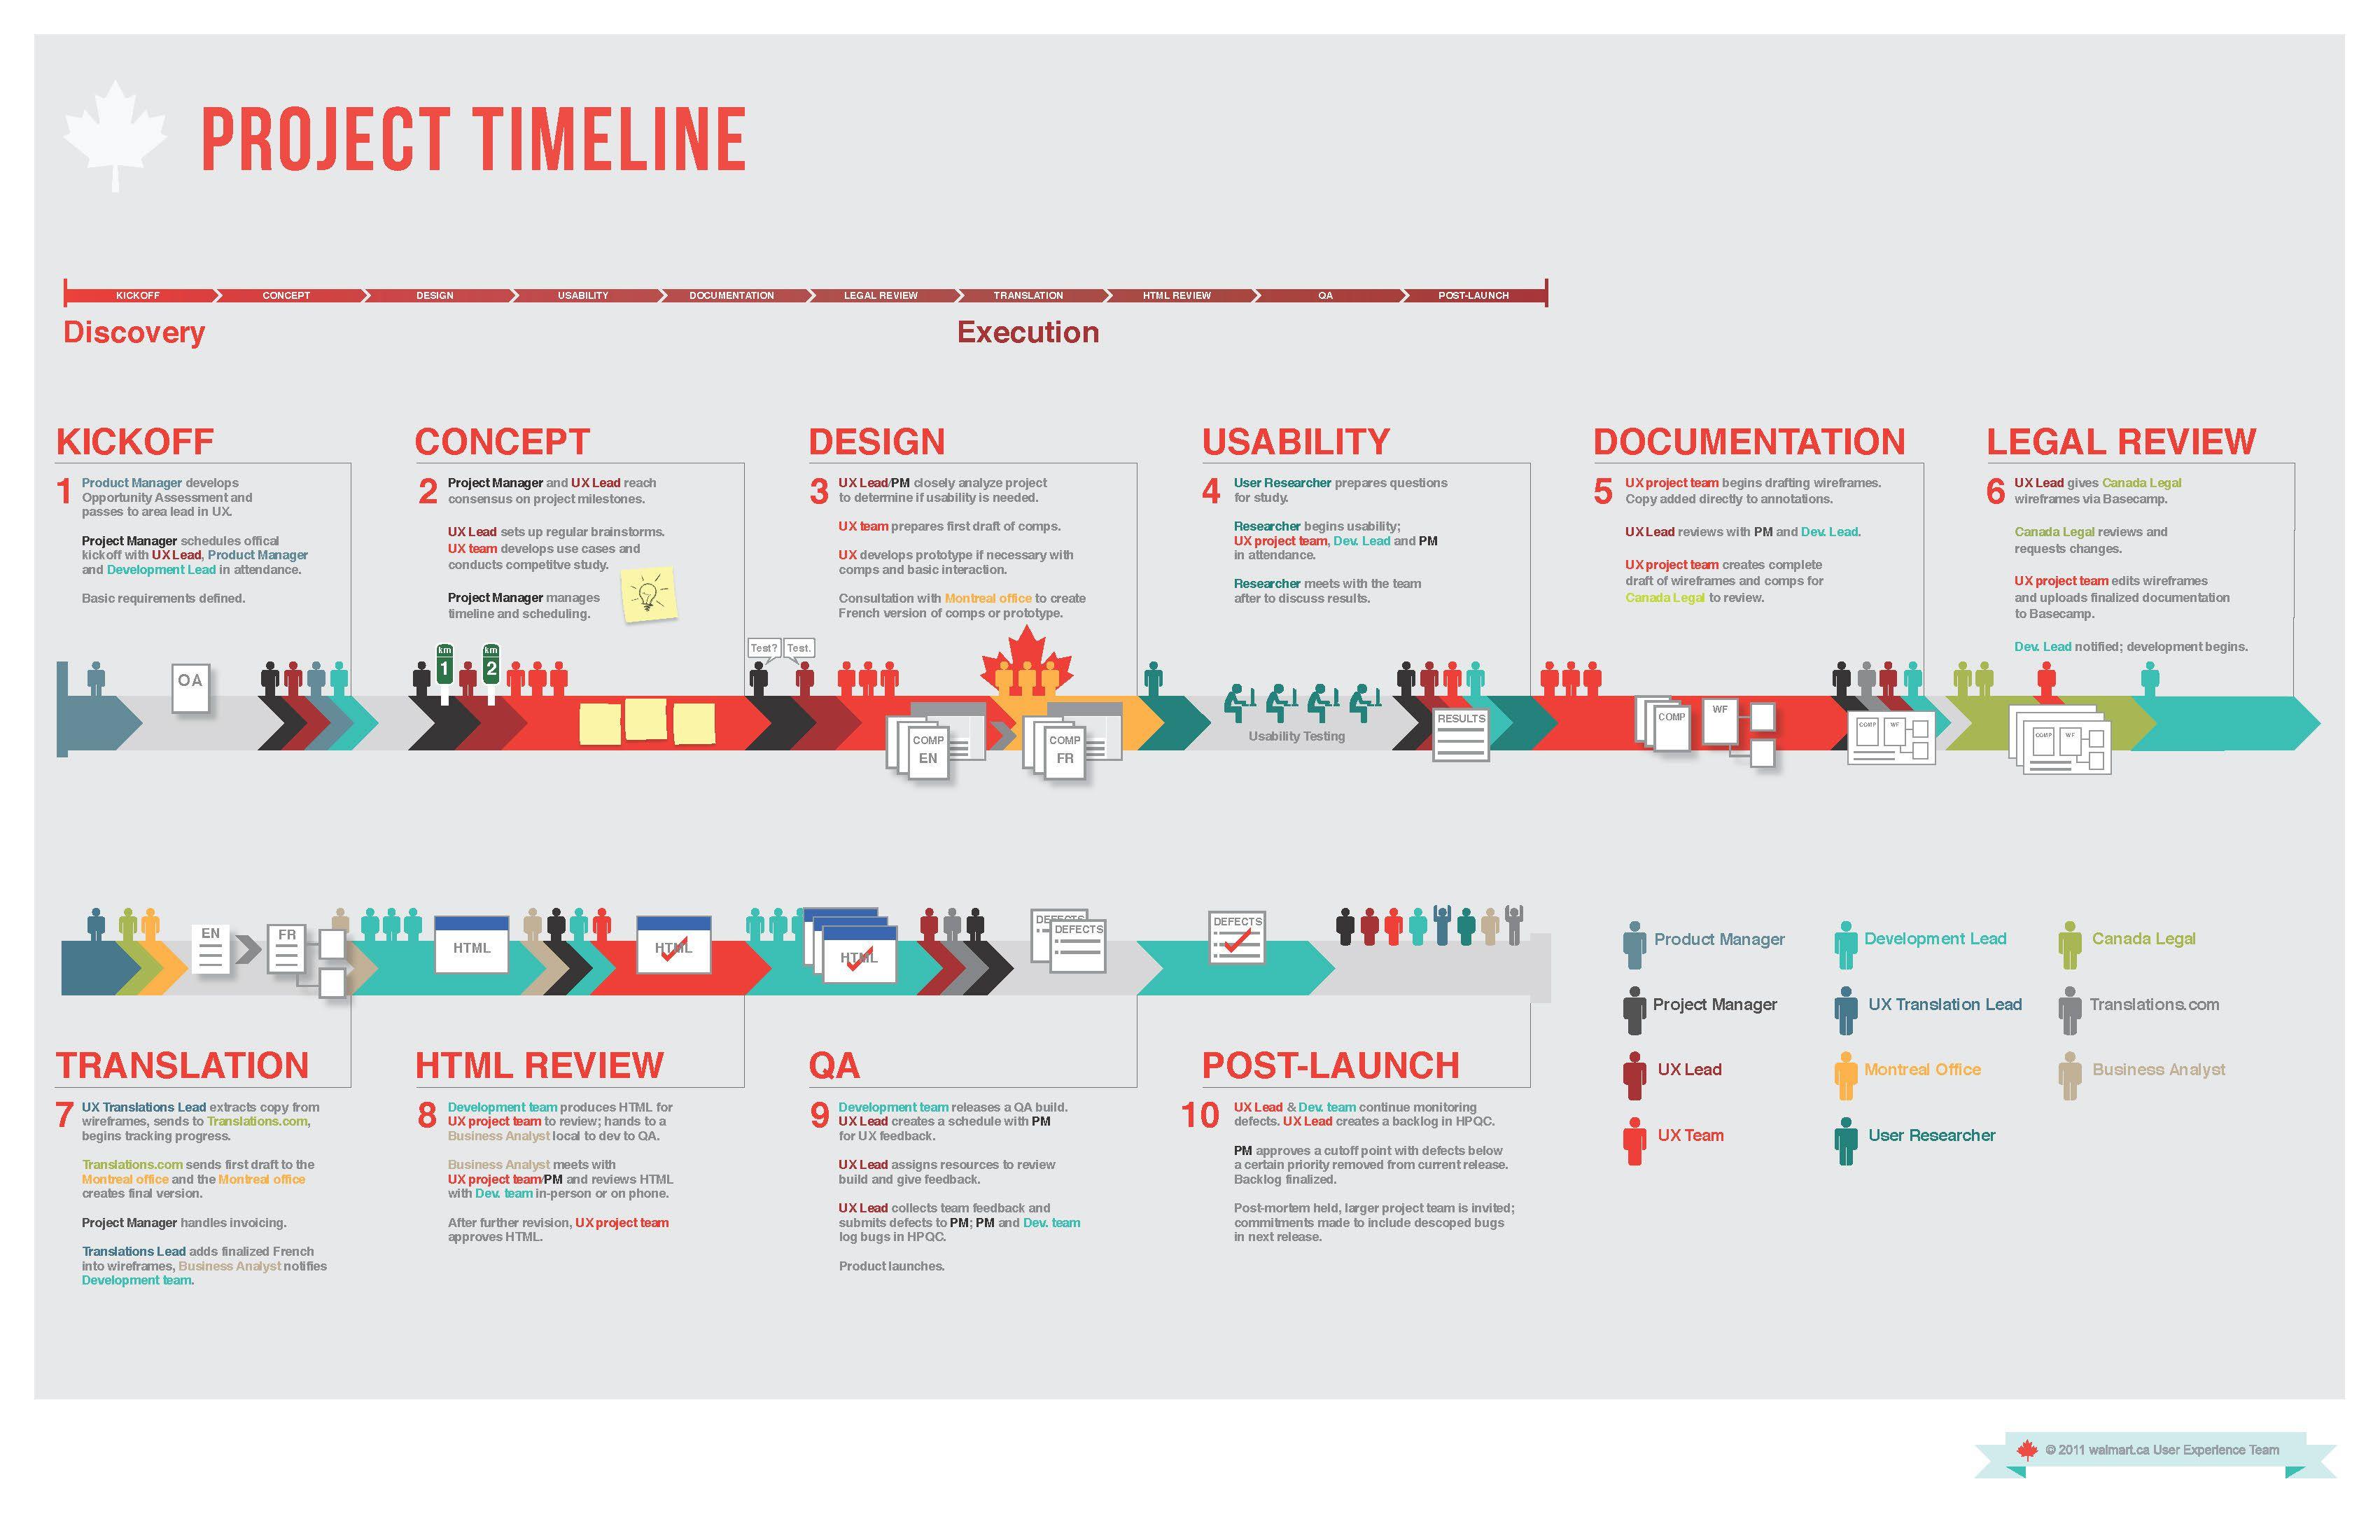 12canada Project Timeline Jpg 3400 2200 Data Visualization Visualisation Infographic Design